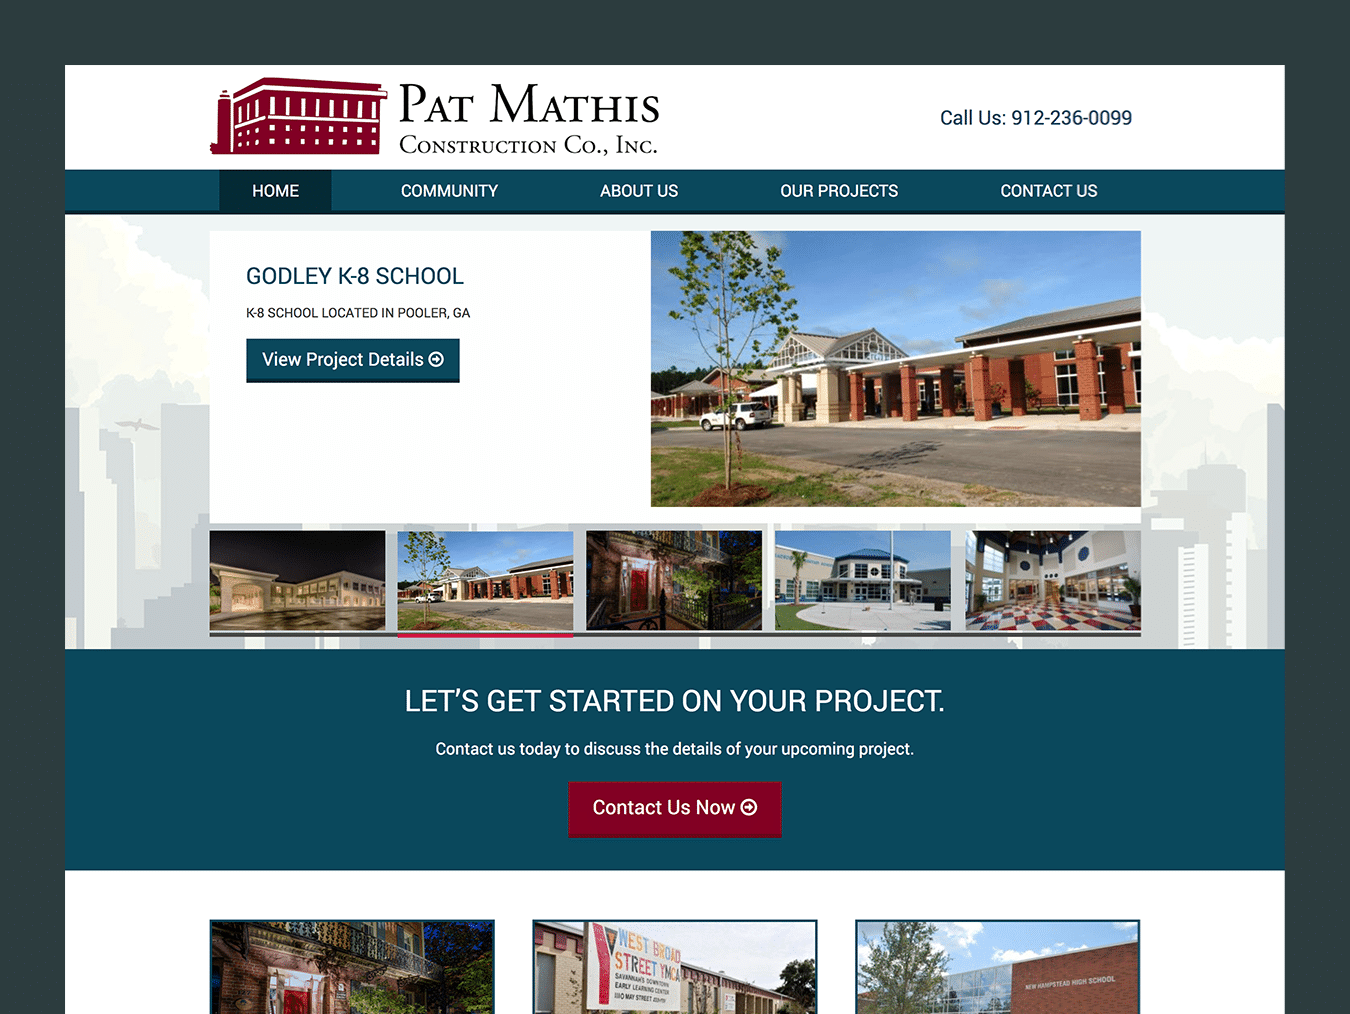 Service company Web Design – Pat Mathis Construction (Thumbnail Design)